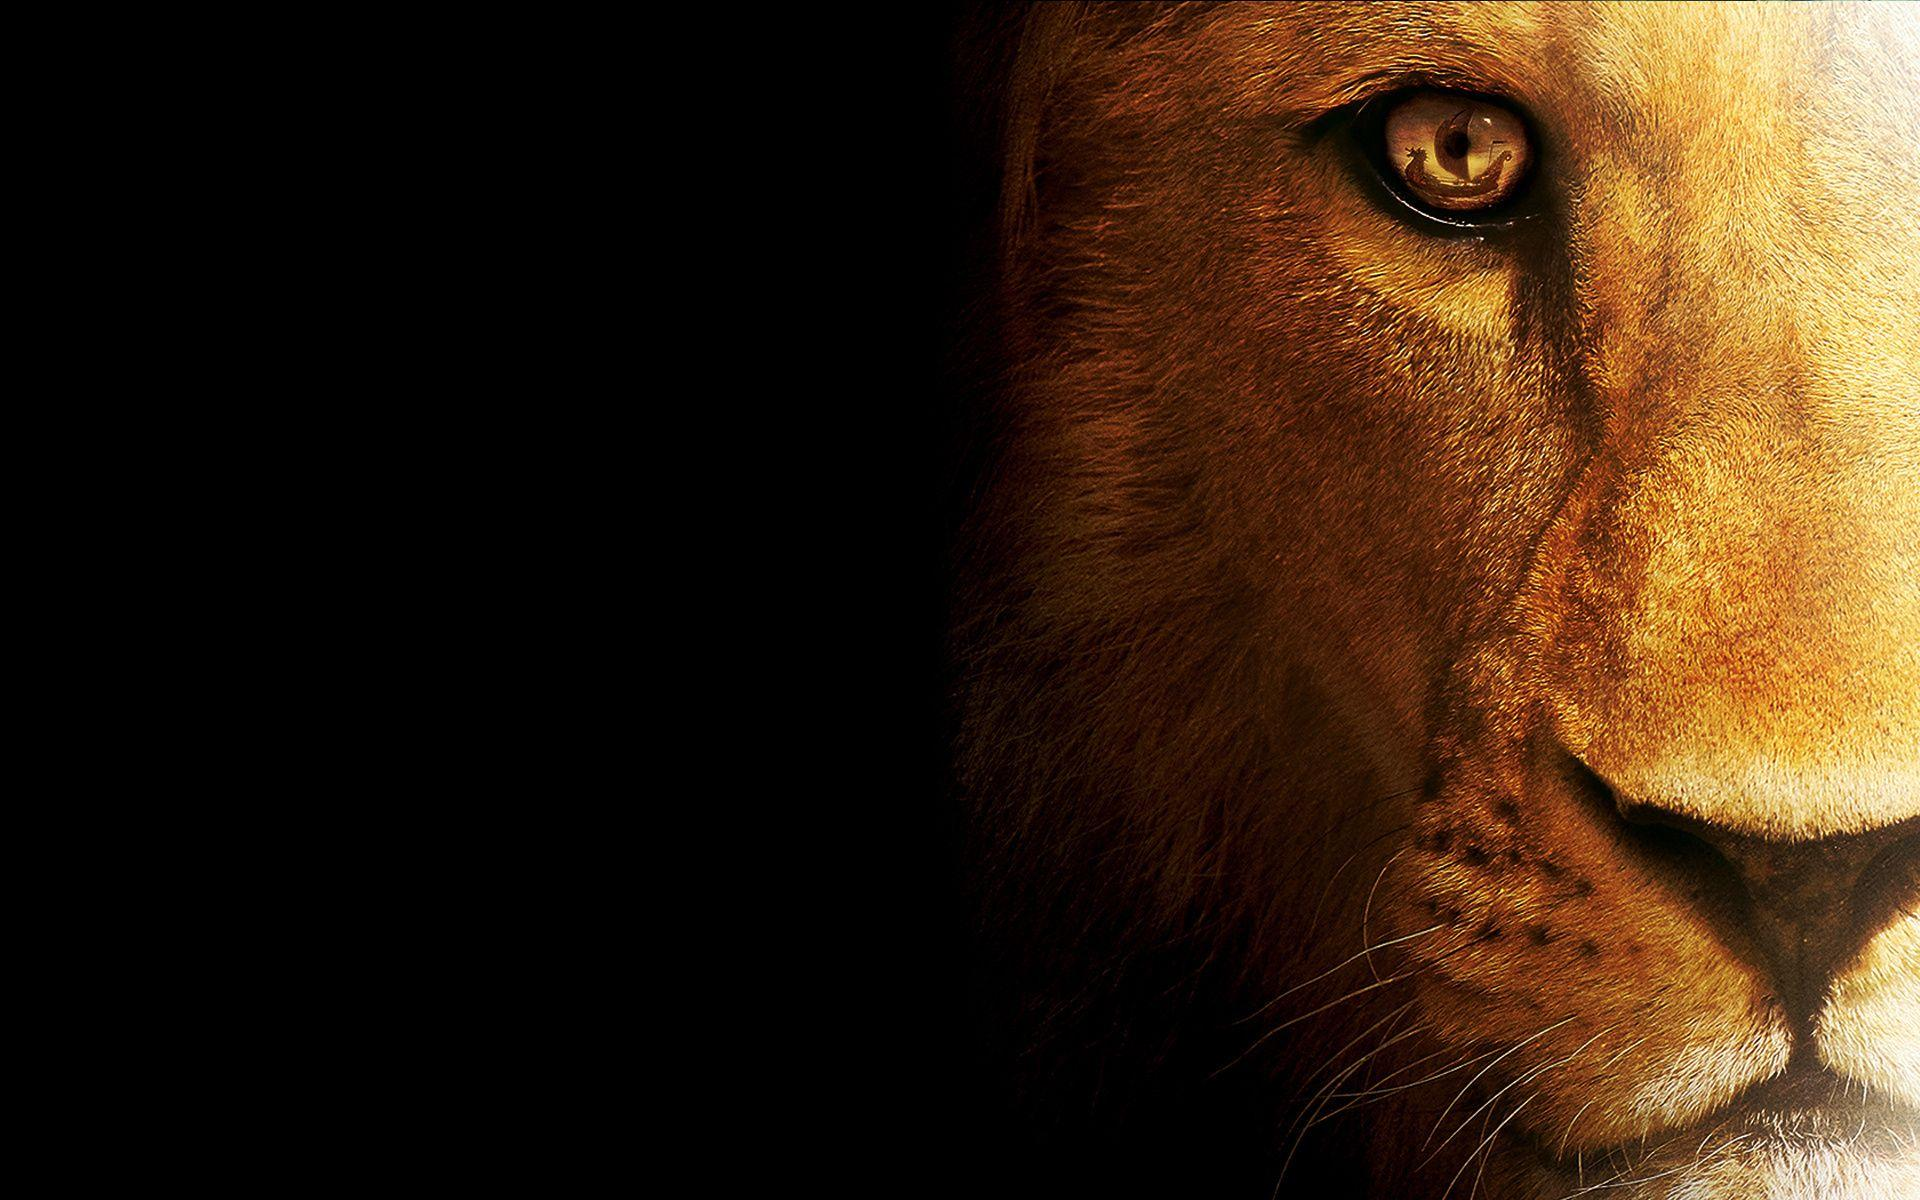 Angry Lion Face Hd Wallpaper Vinny Oleo Vegetal Info